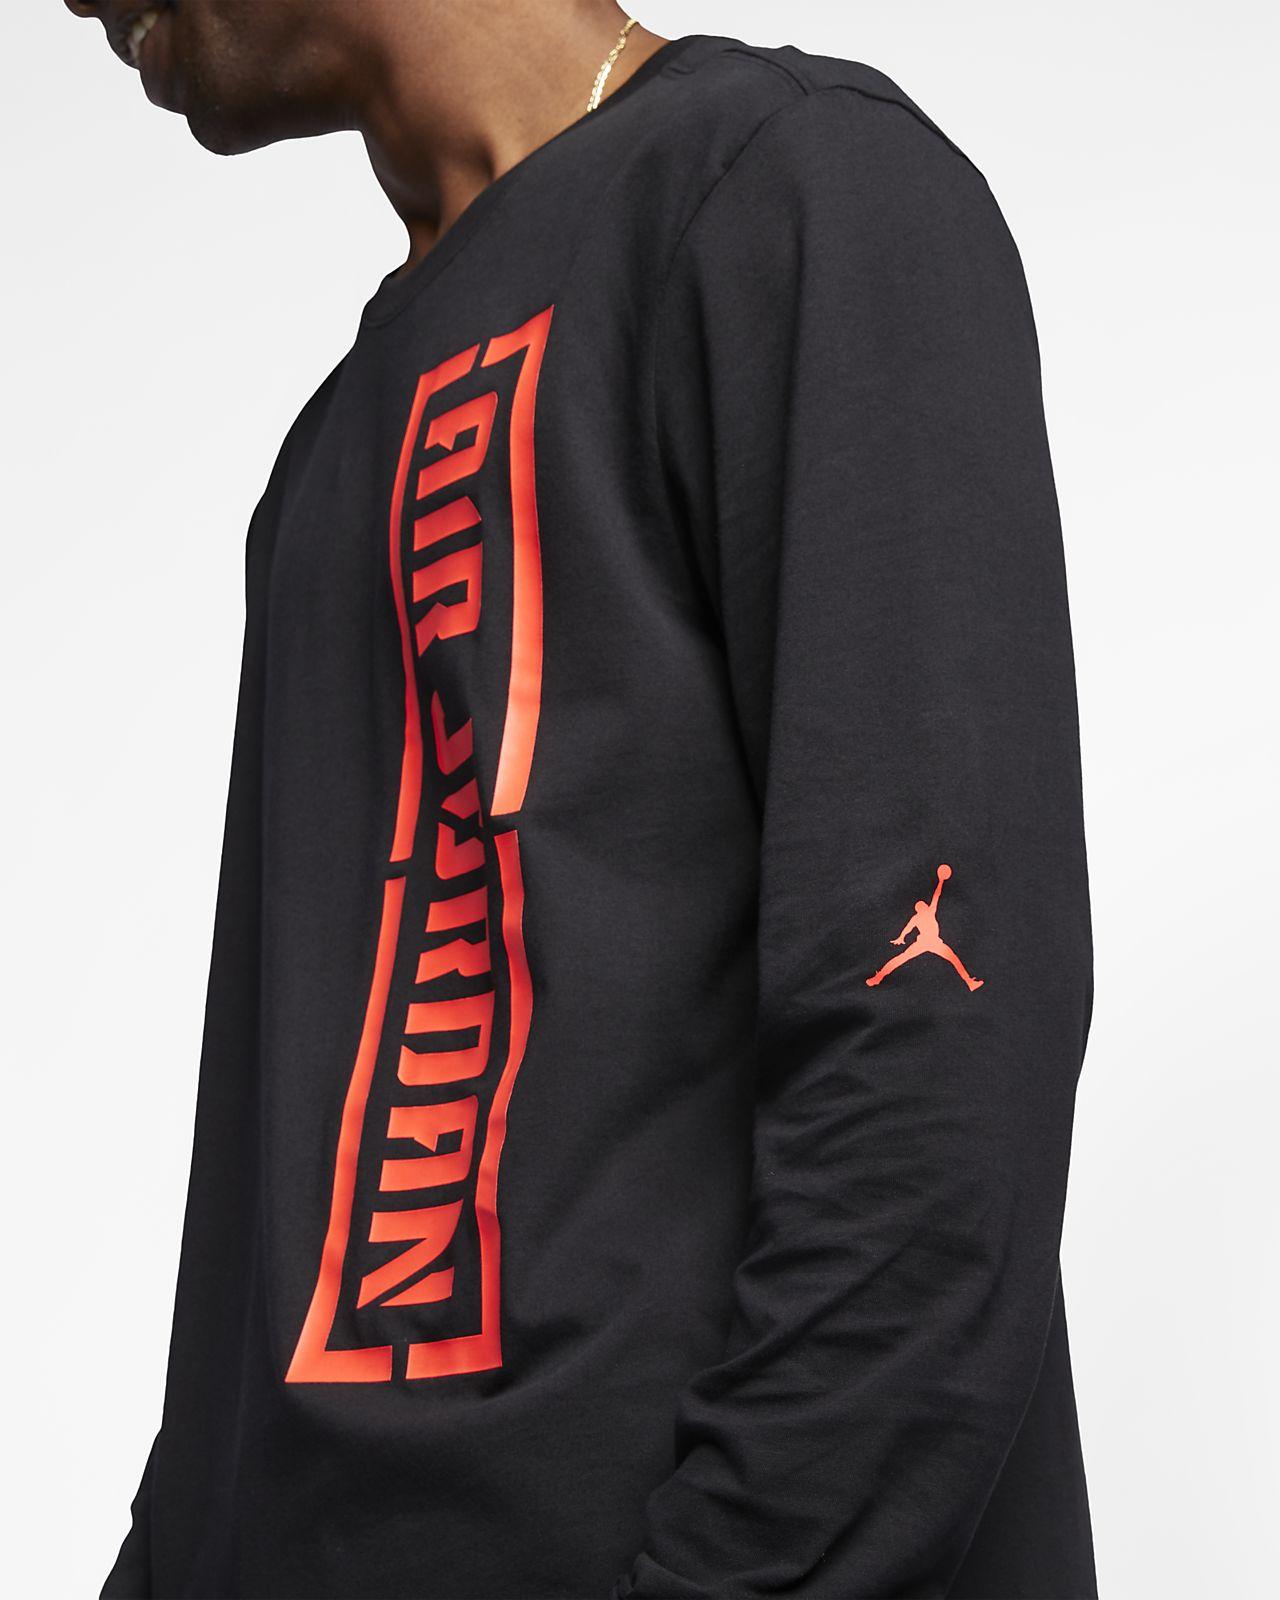 3f0cea9166e068 Jordan Men s Long-Sleeve T-Shirt. Nike.com IN